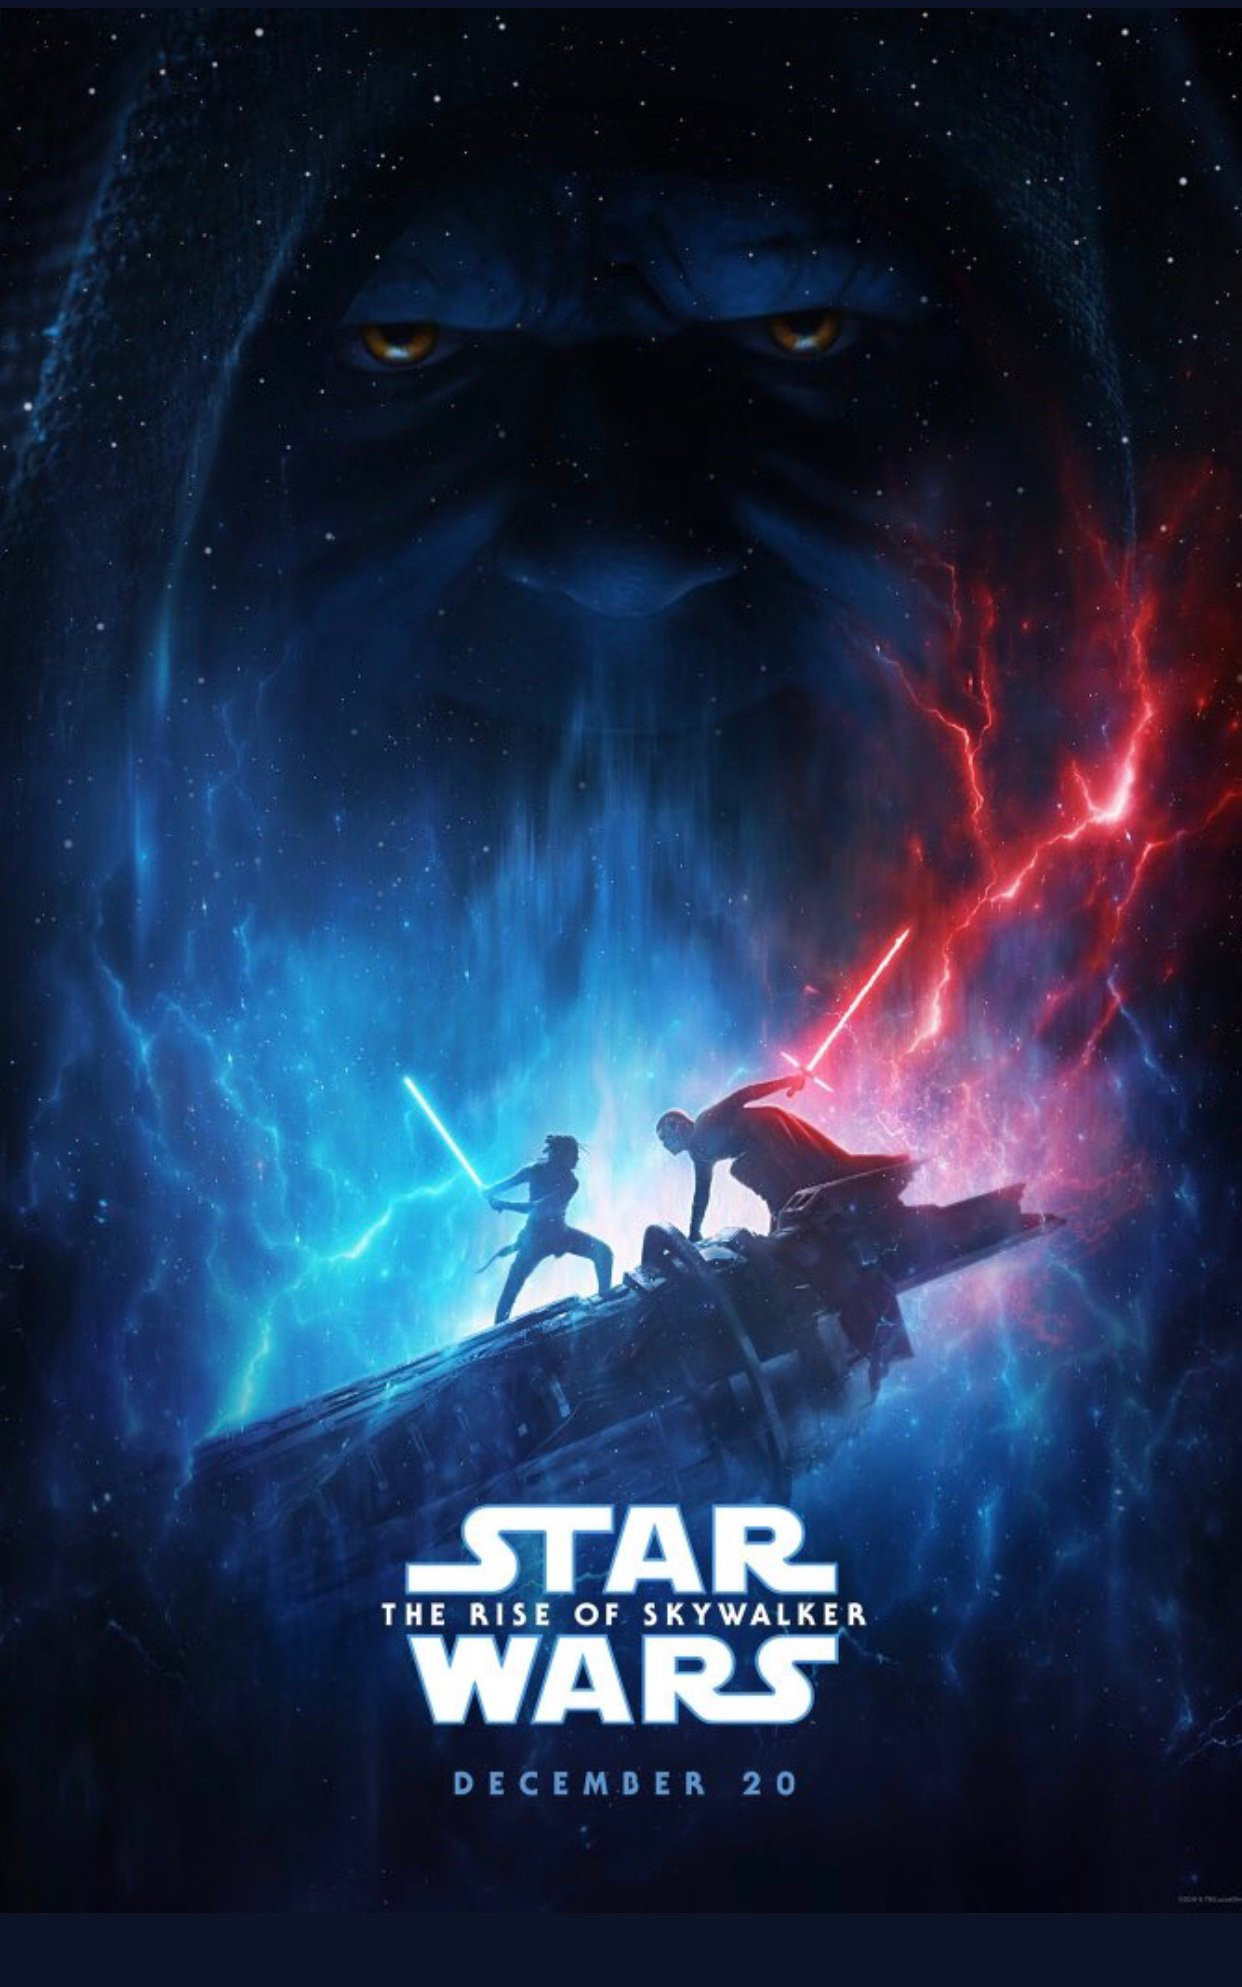 Star Wars: The Rise of Skywalker D23 poster